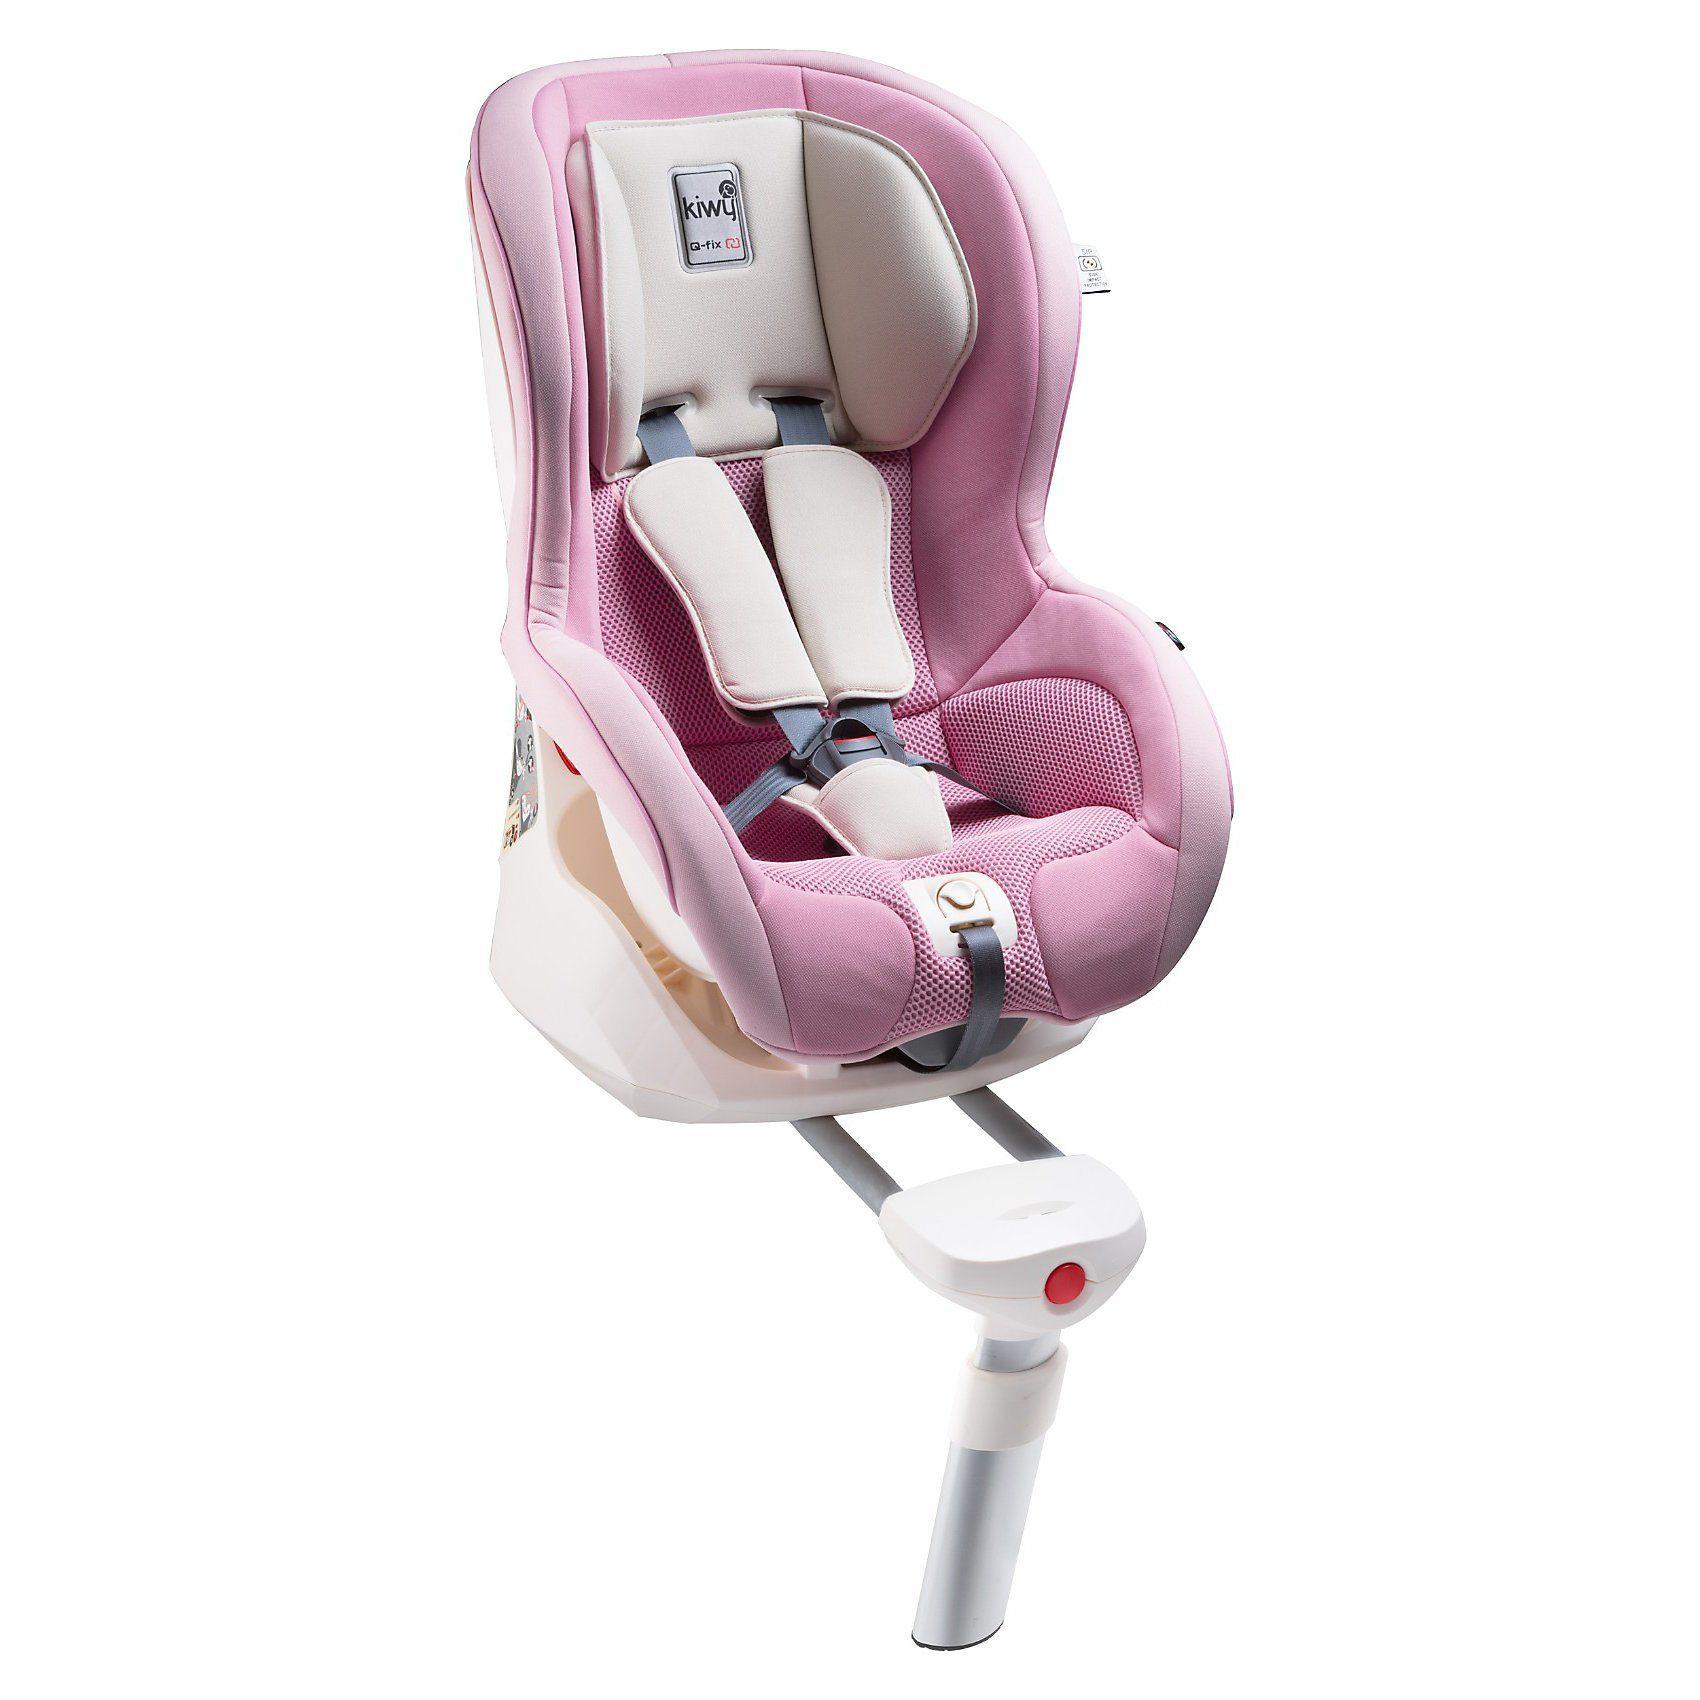 Kiwy Auto-Kindersitz SPF1 SA-ATS, Isofix, Candy, 2016